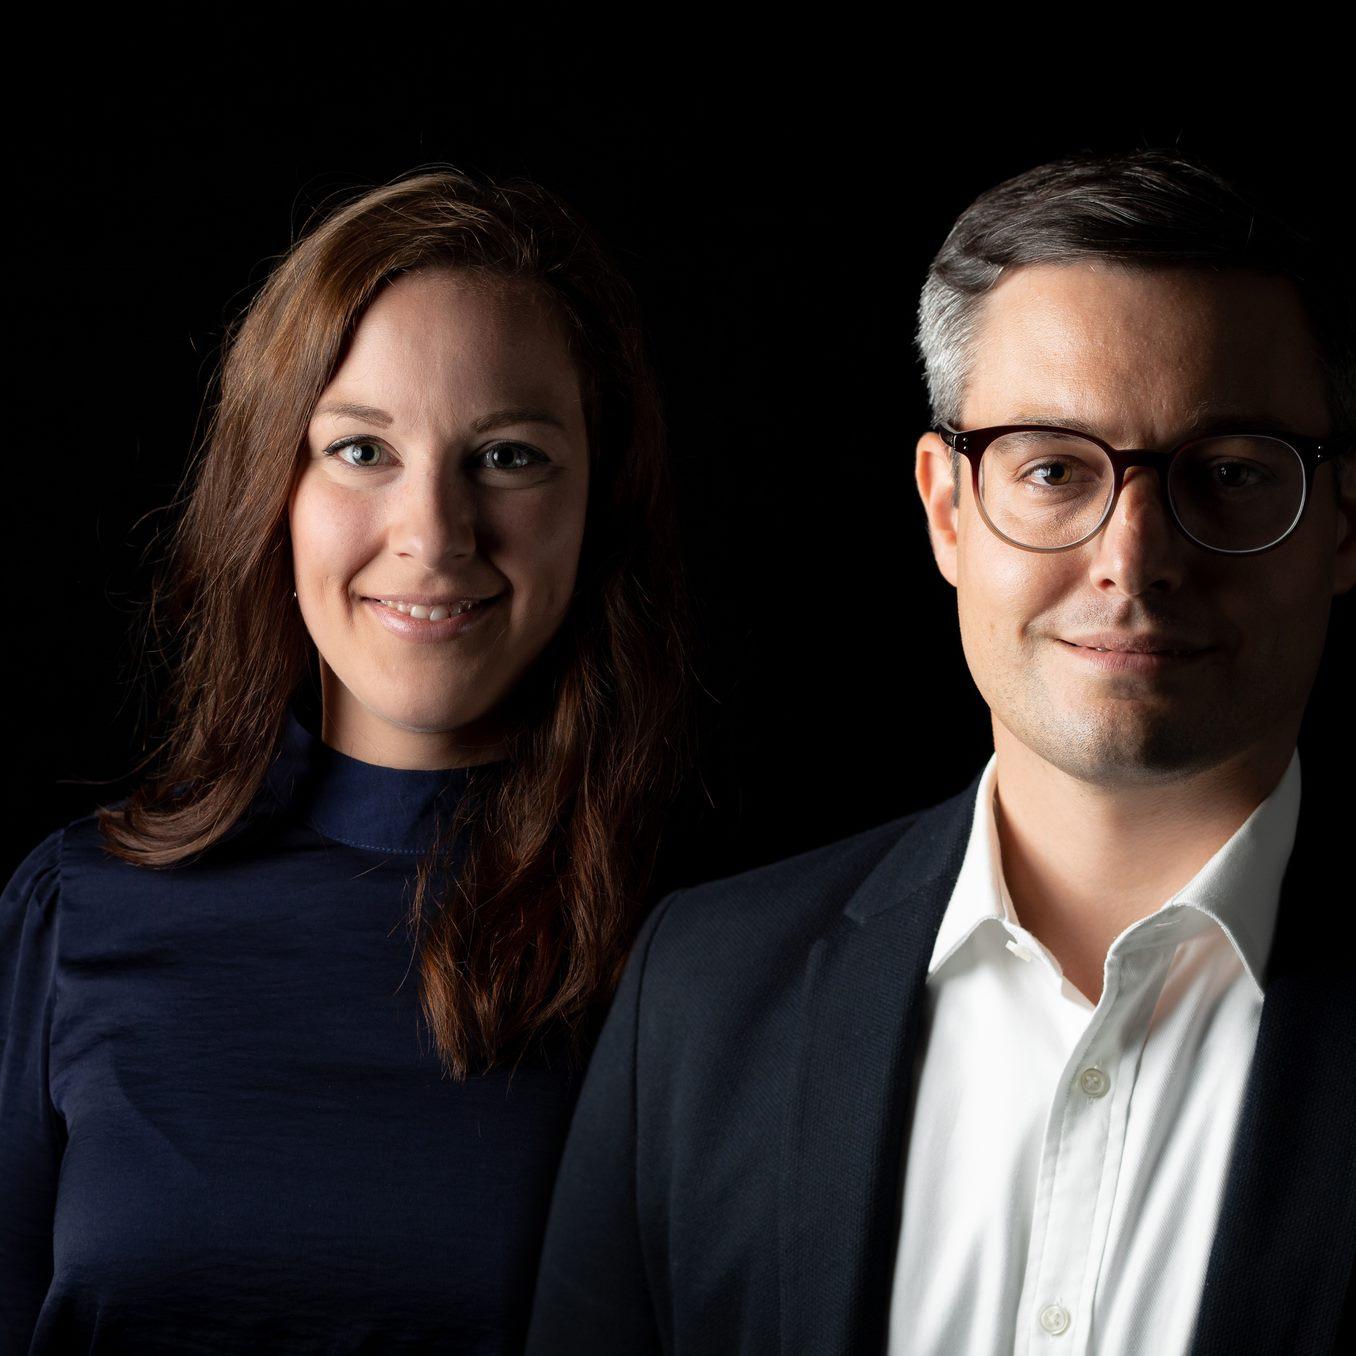 Ramona Bischoff und Samuel Gerber